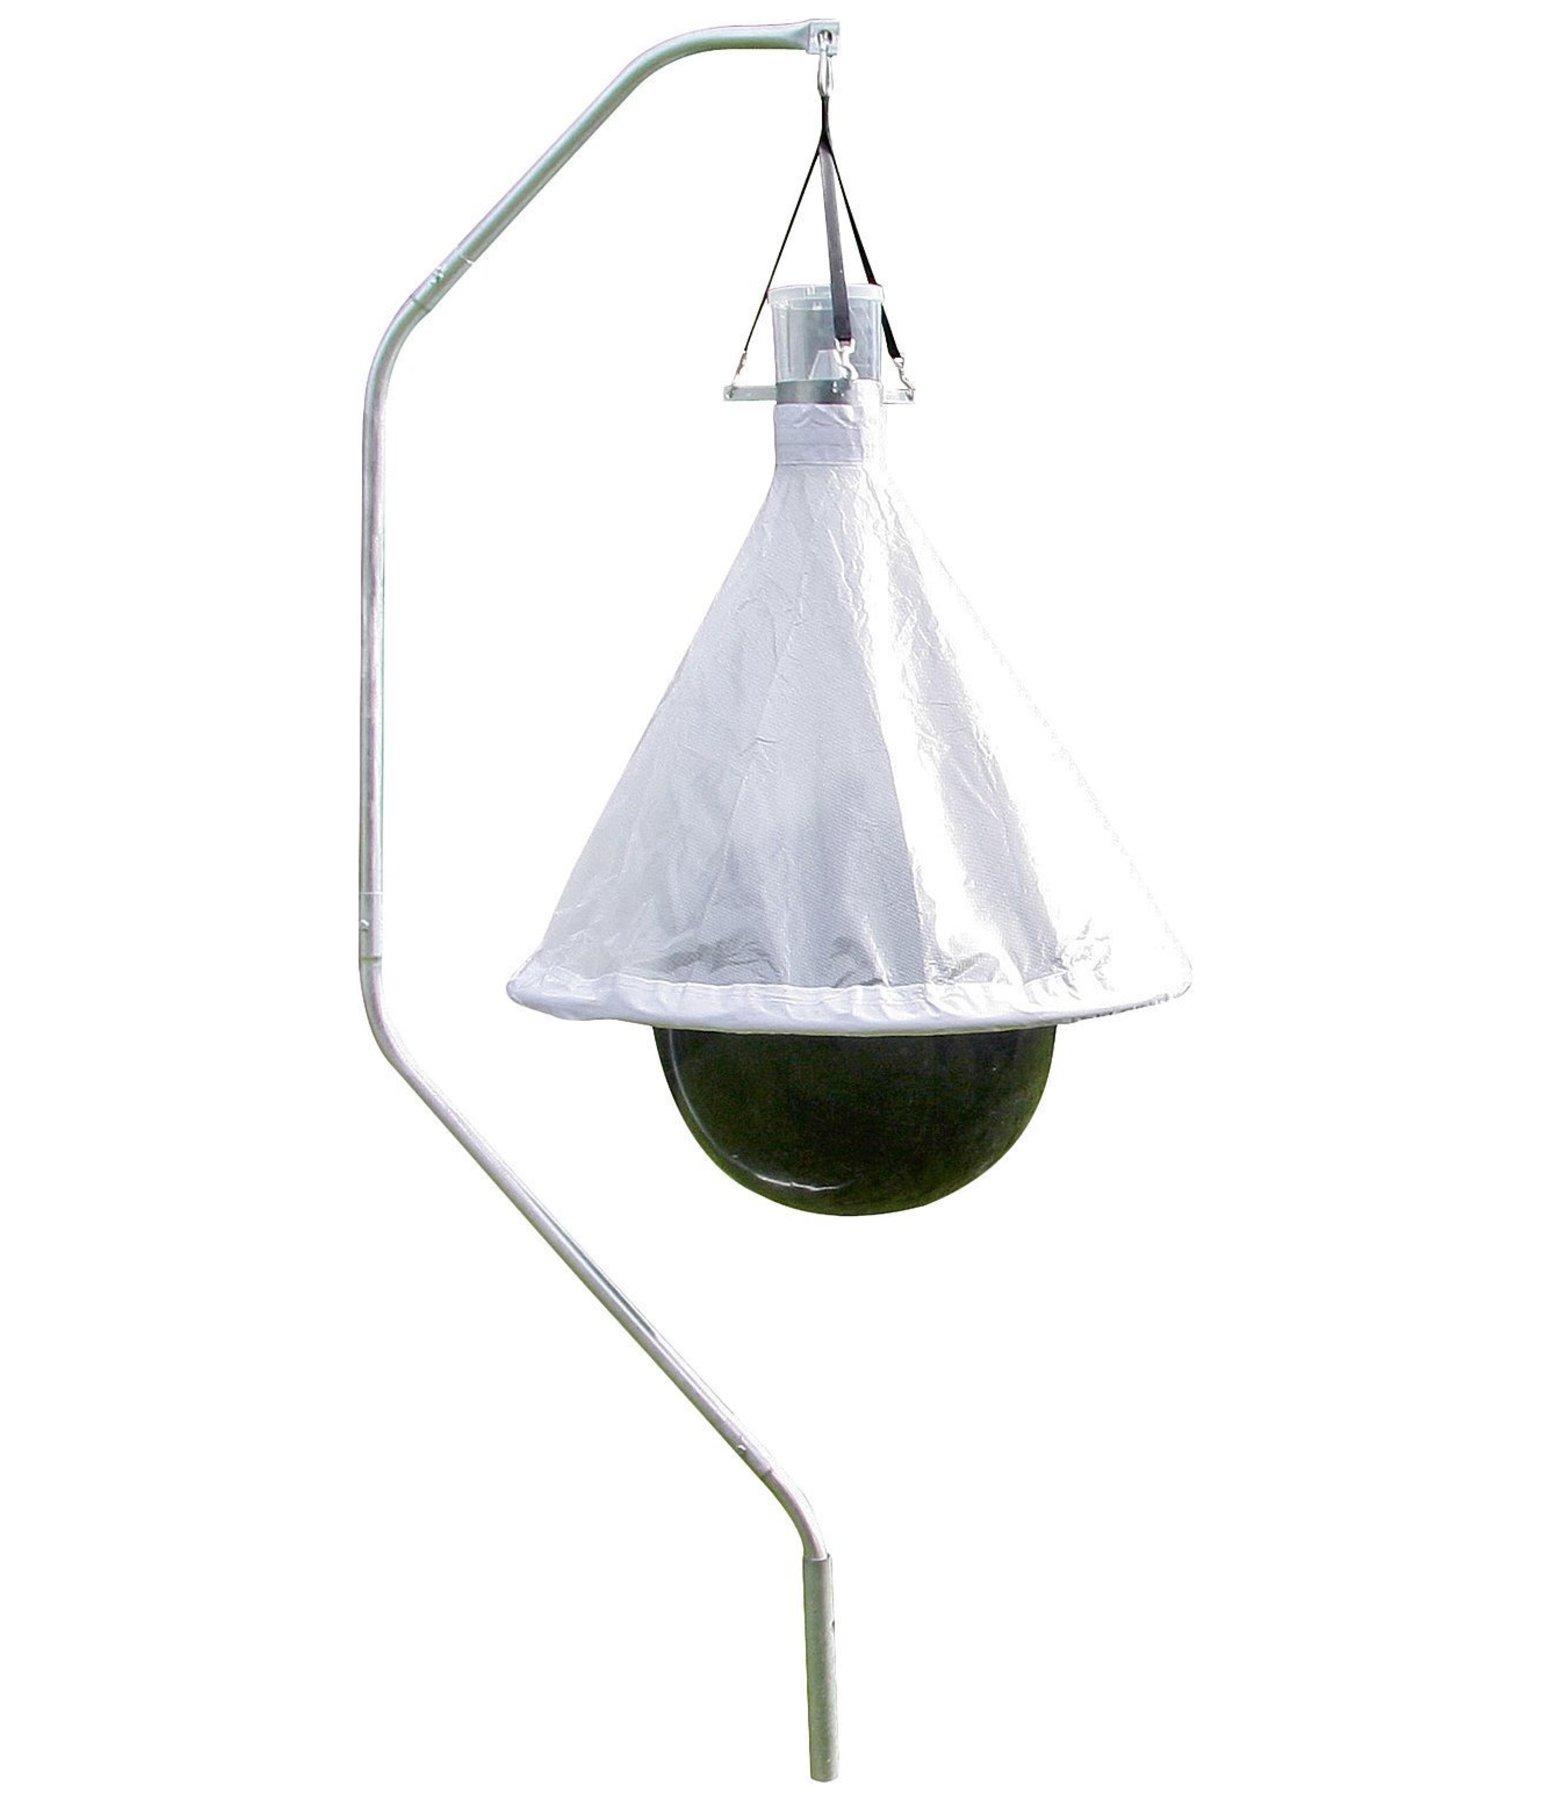 pi ge pour taons taon x protections anti mouches pour l 39 curie kramer equitation. Black Bedroom Furniture Sets. Home Design Ideas